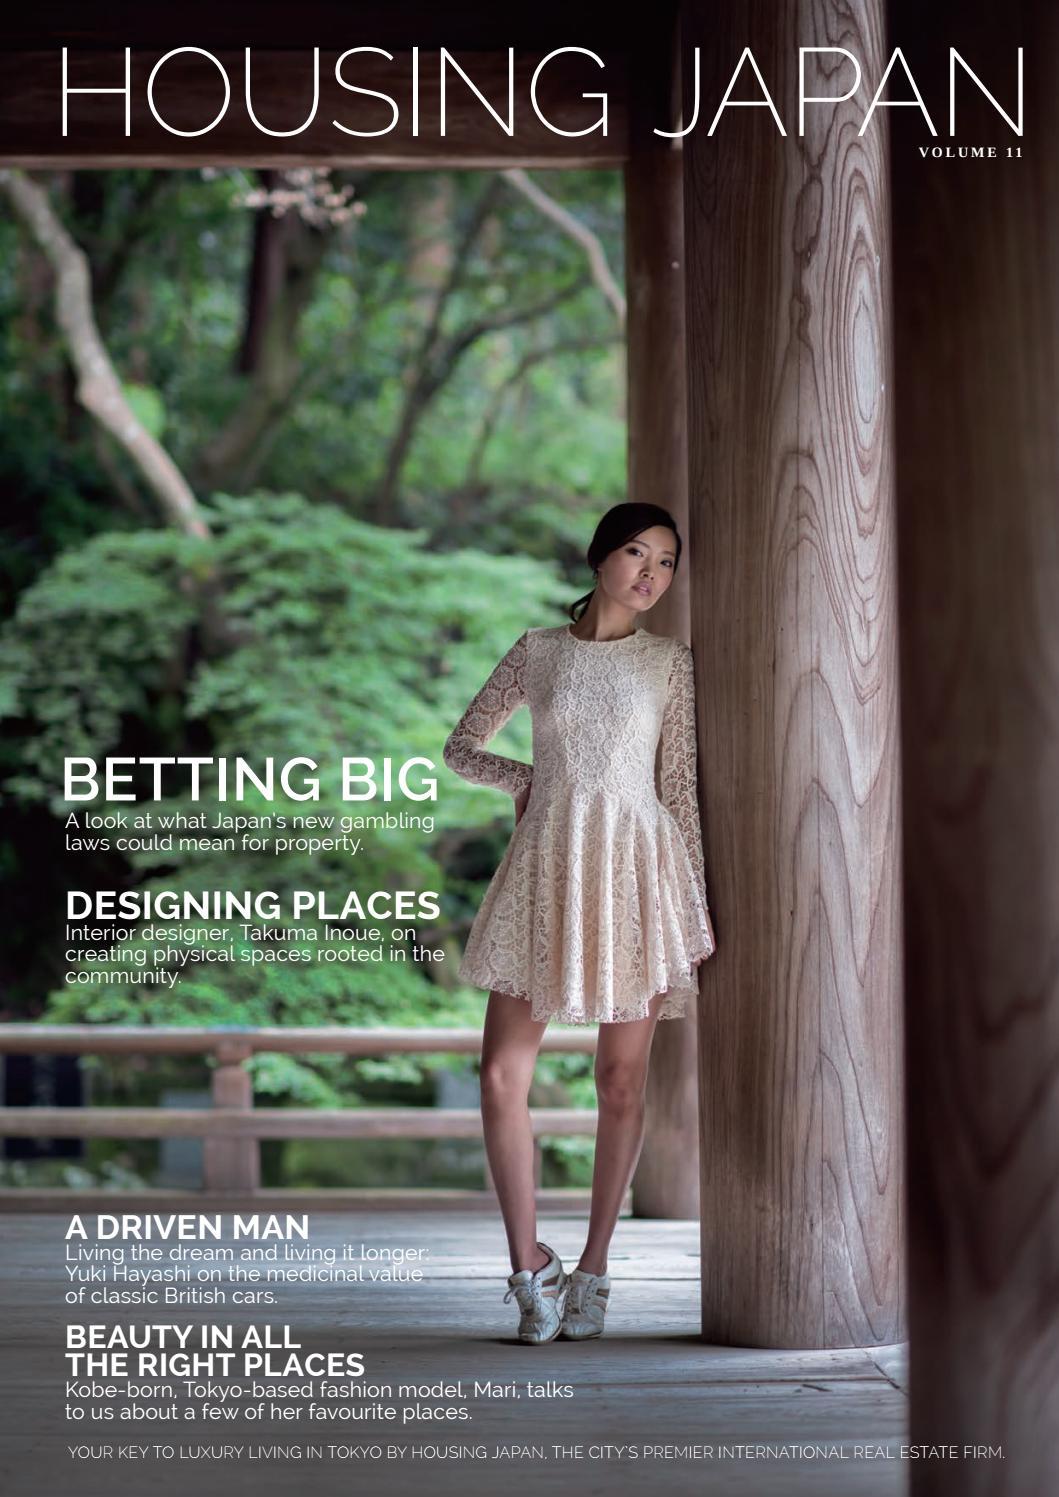 Housing Japan Magazine Vol11 Spring Summer 2017 By